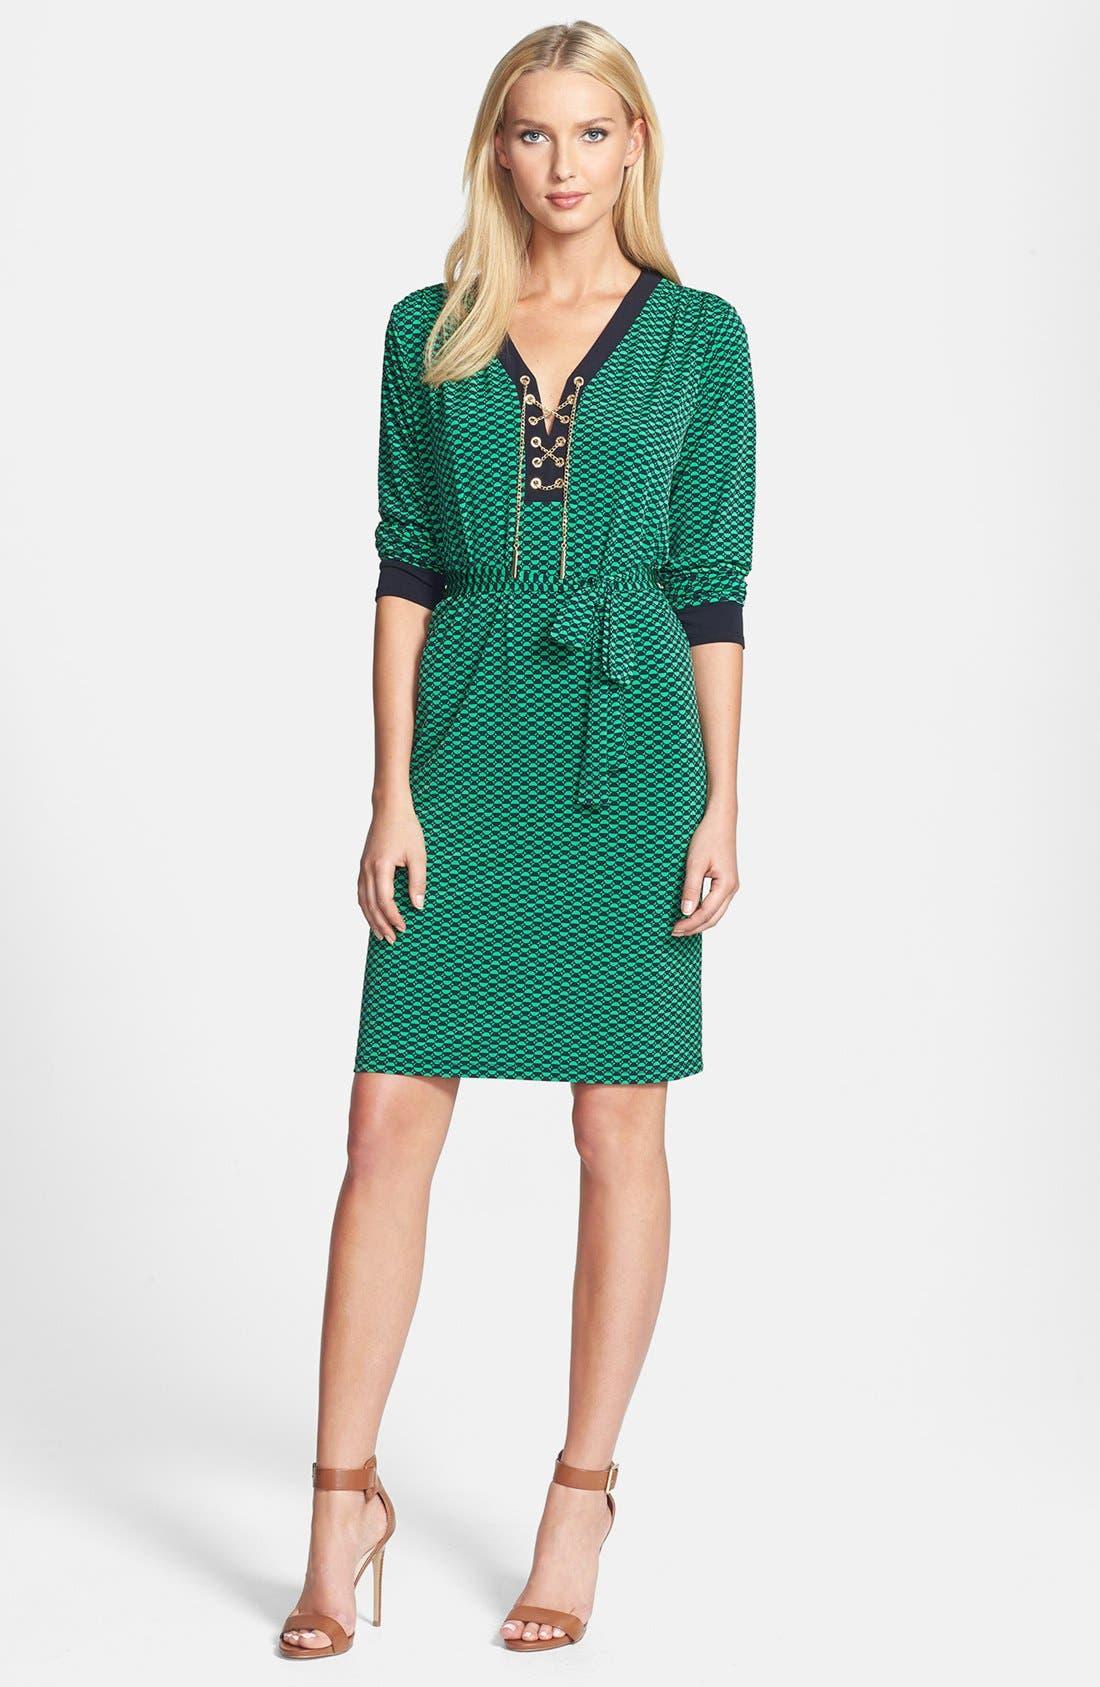 Main Image - MICHAEL Michael Kors Lace Up Belted Knit Dress (Regular & Petite)